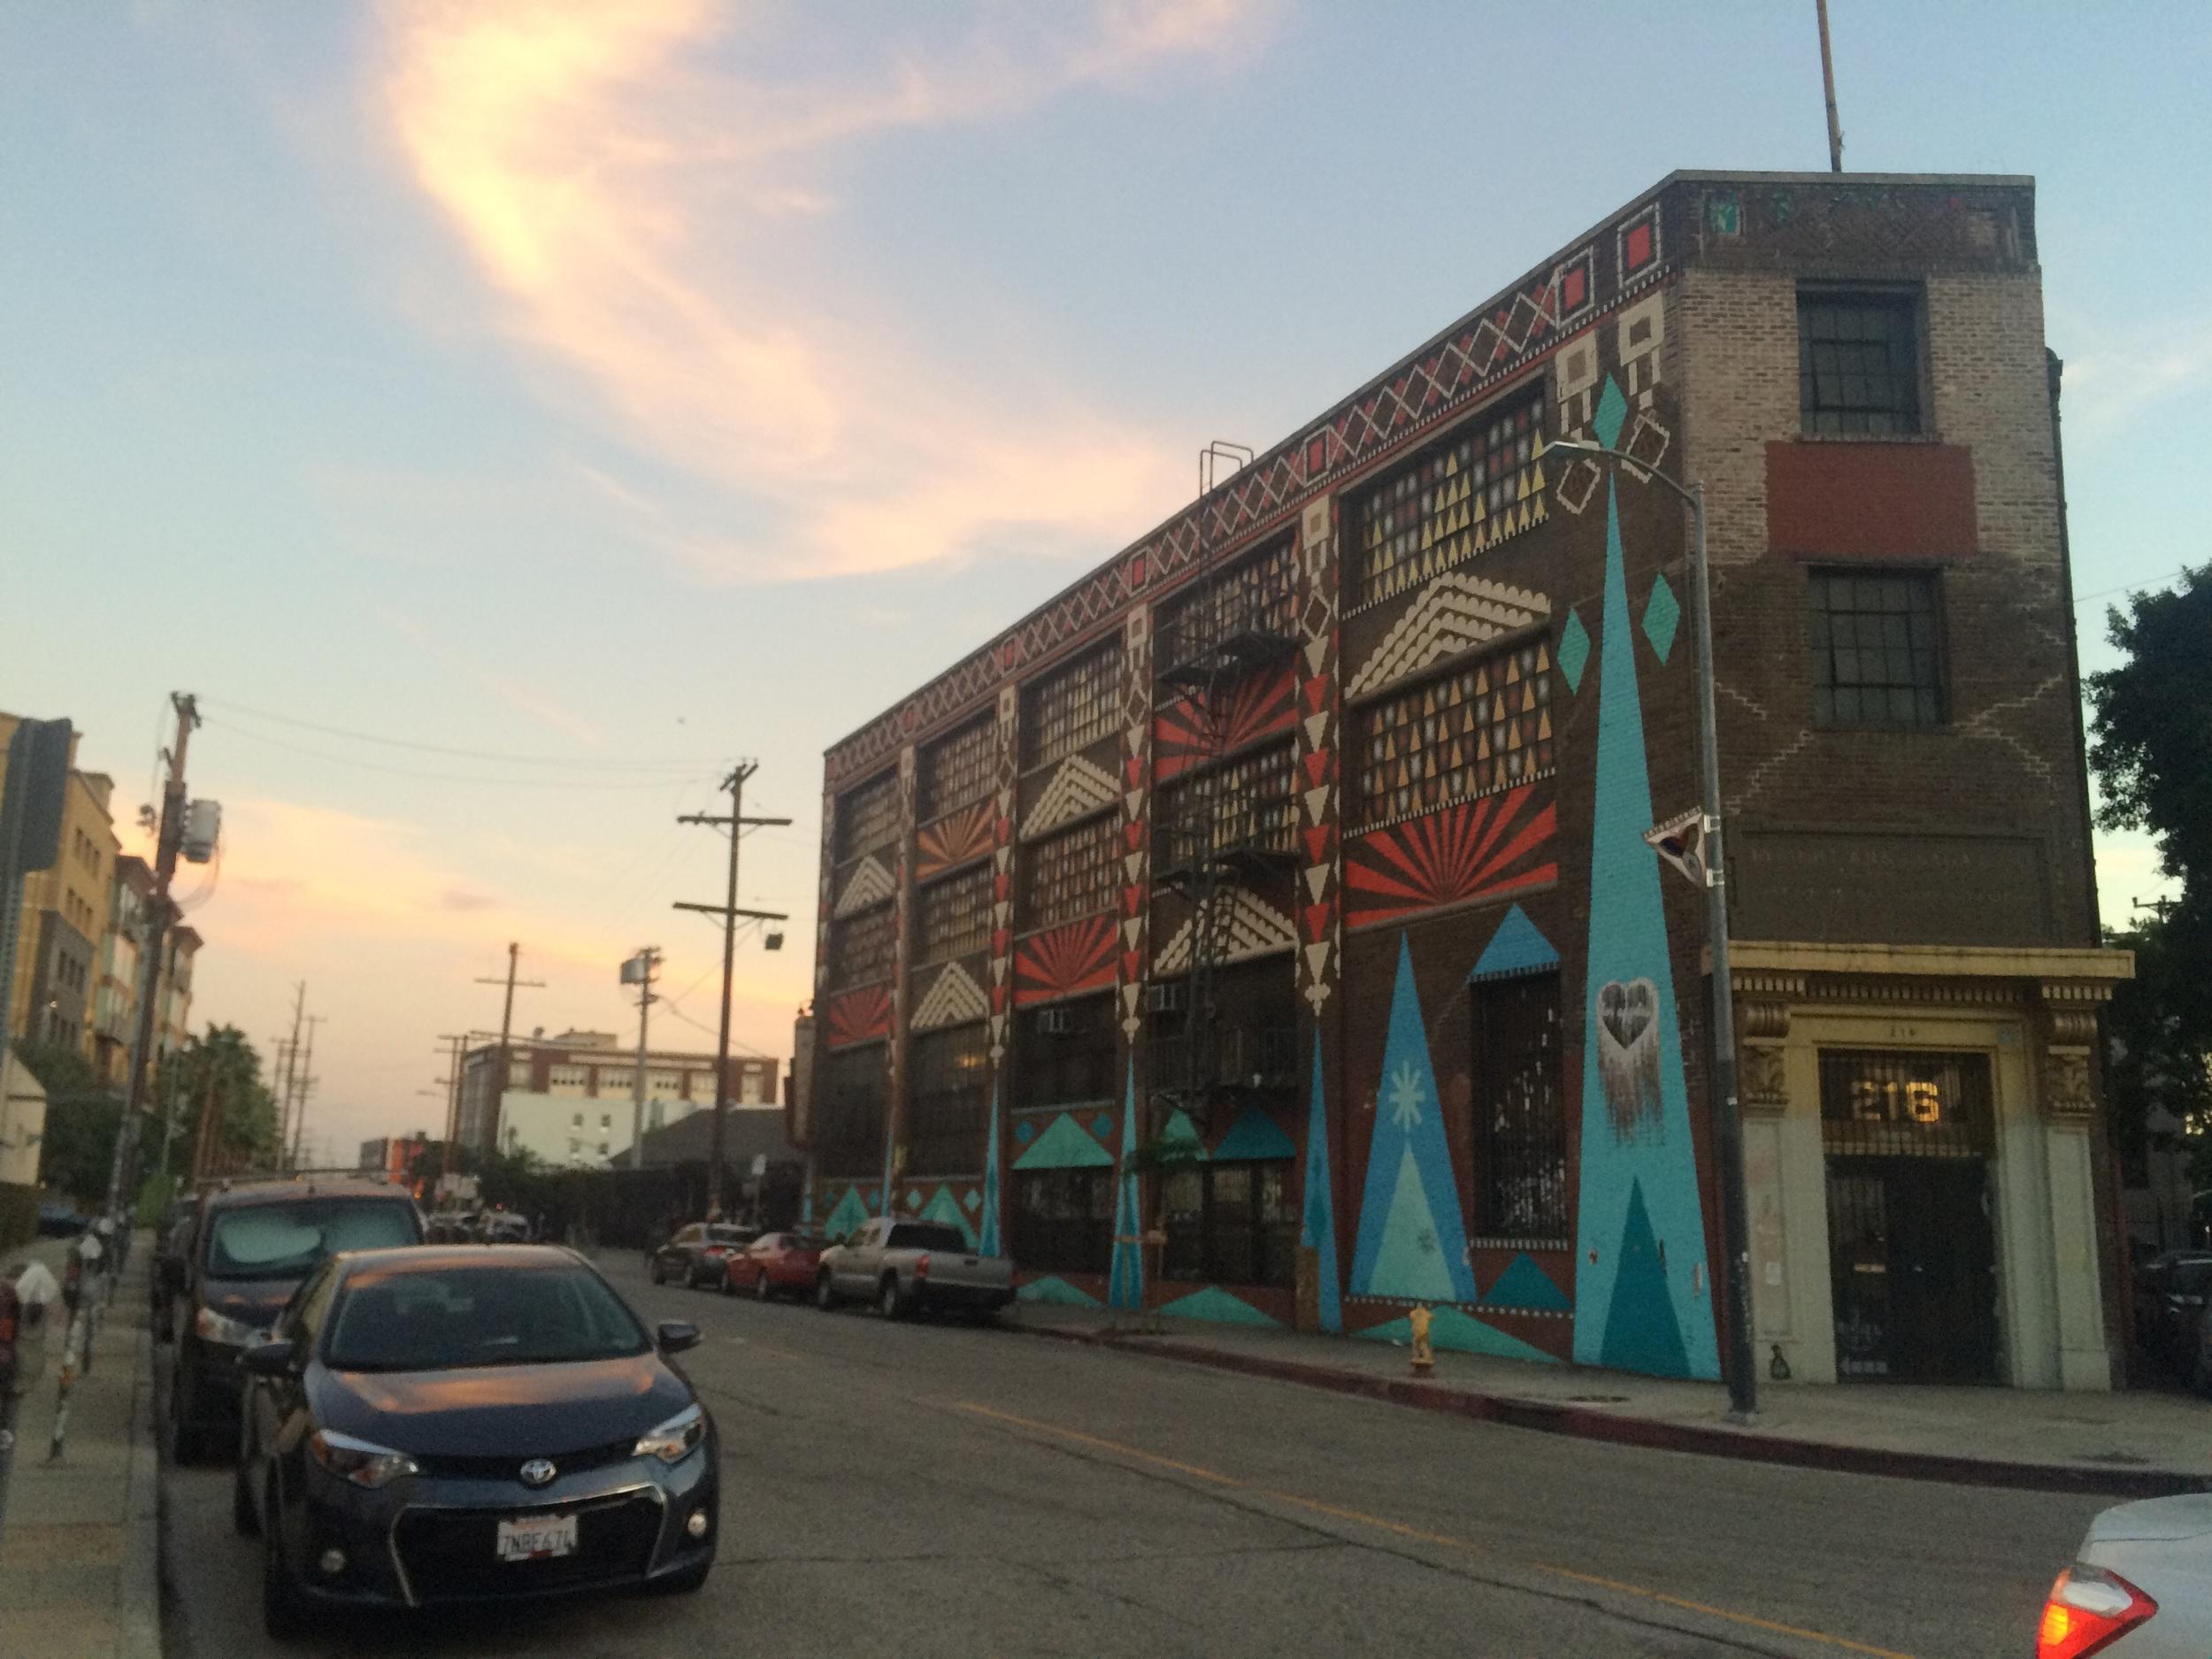 2nd & Alameda. Building mural by Shrineon.